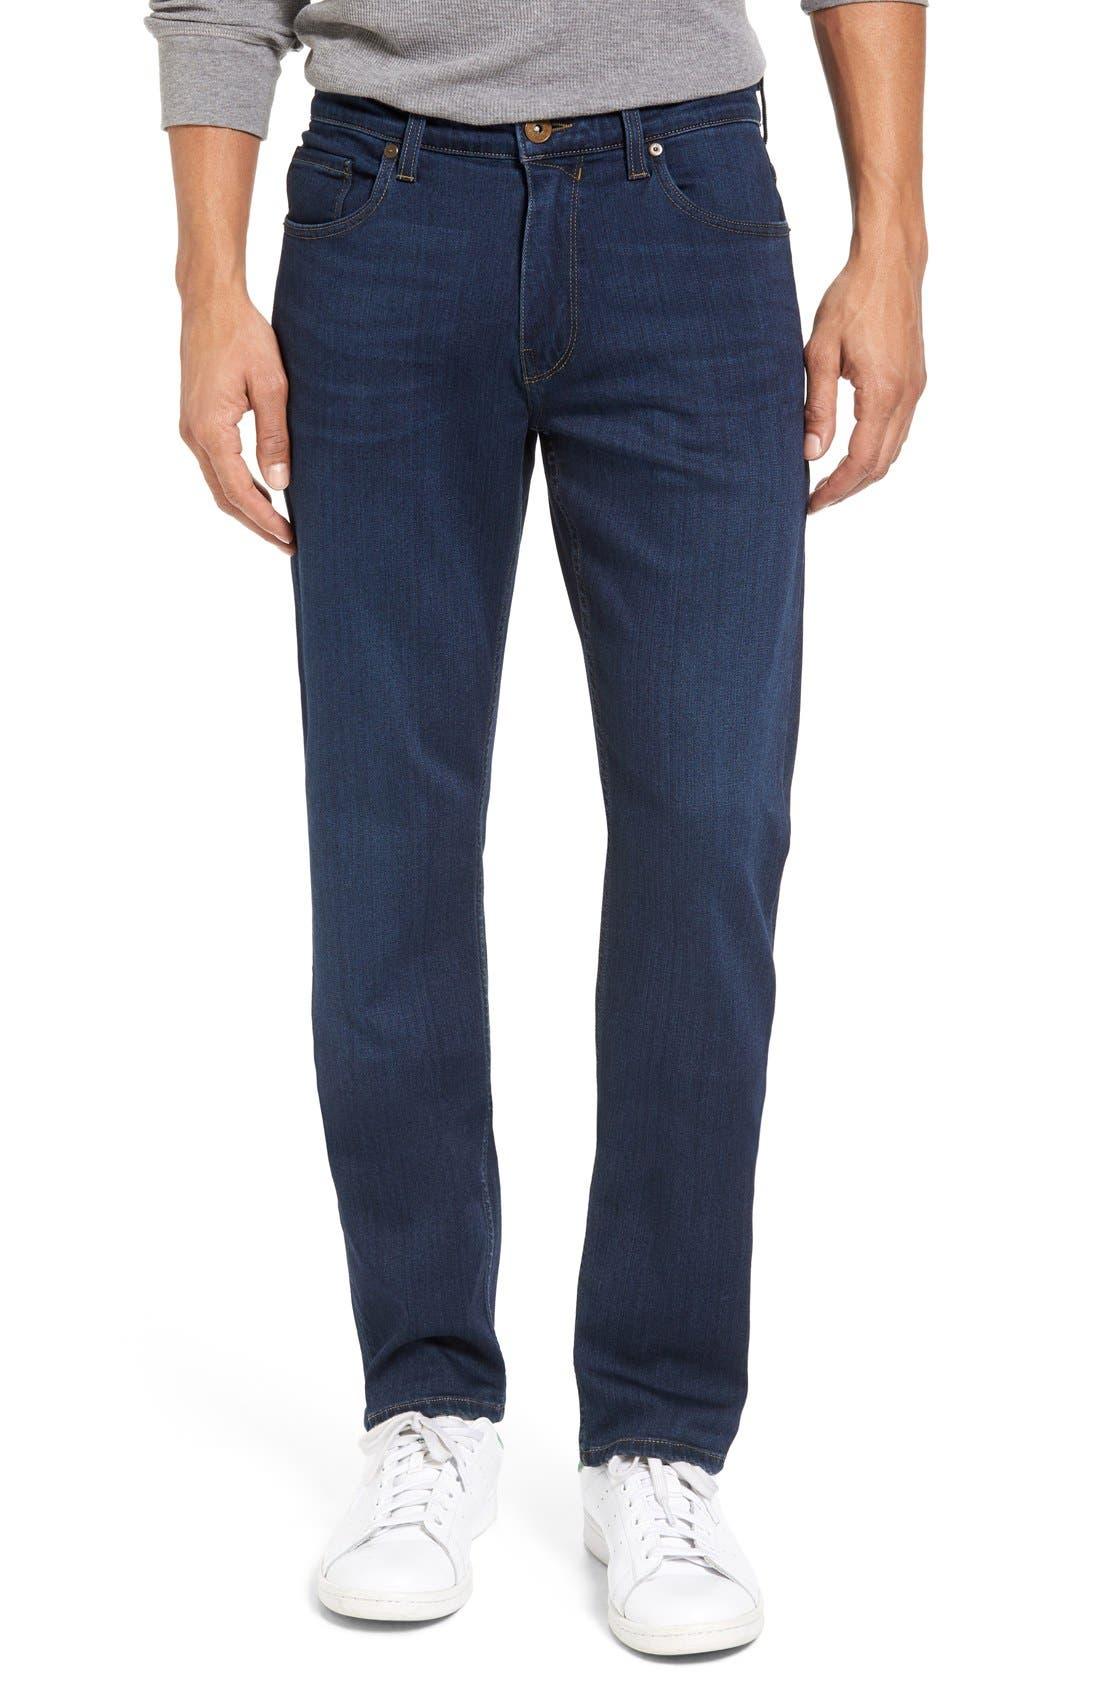 Transcend - Federal Slim Straight Leg Jeans,                         Main,                         color, Scott